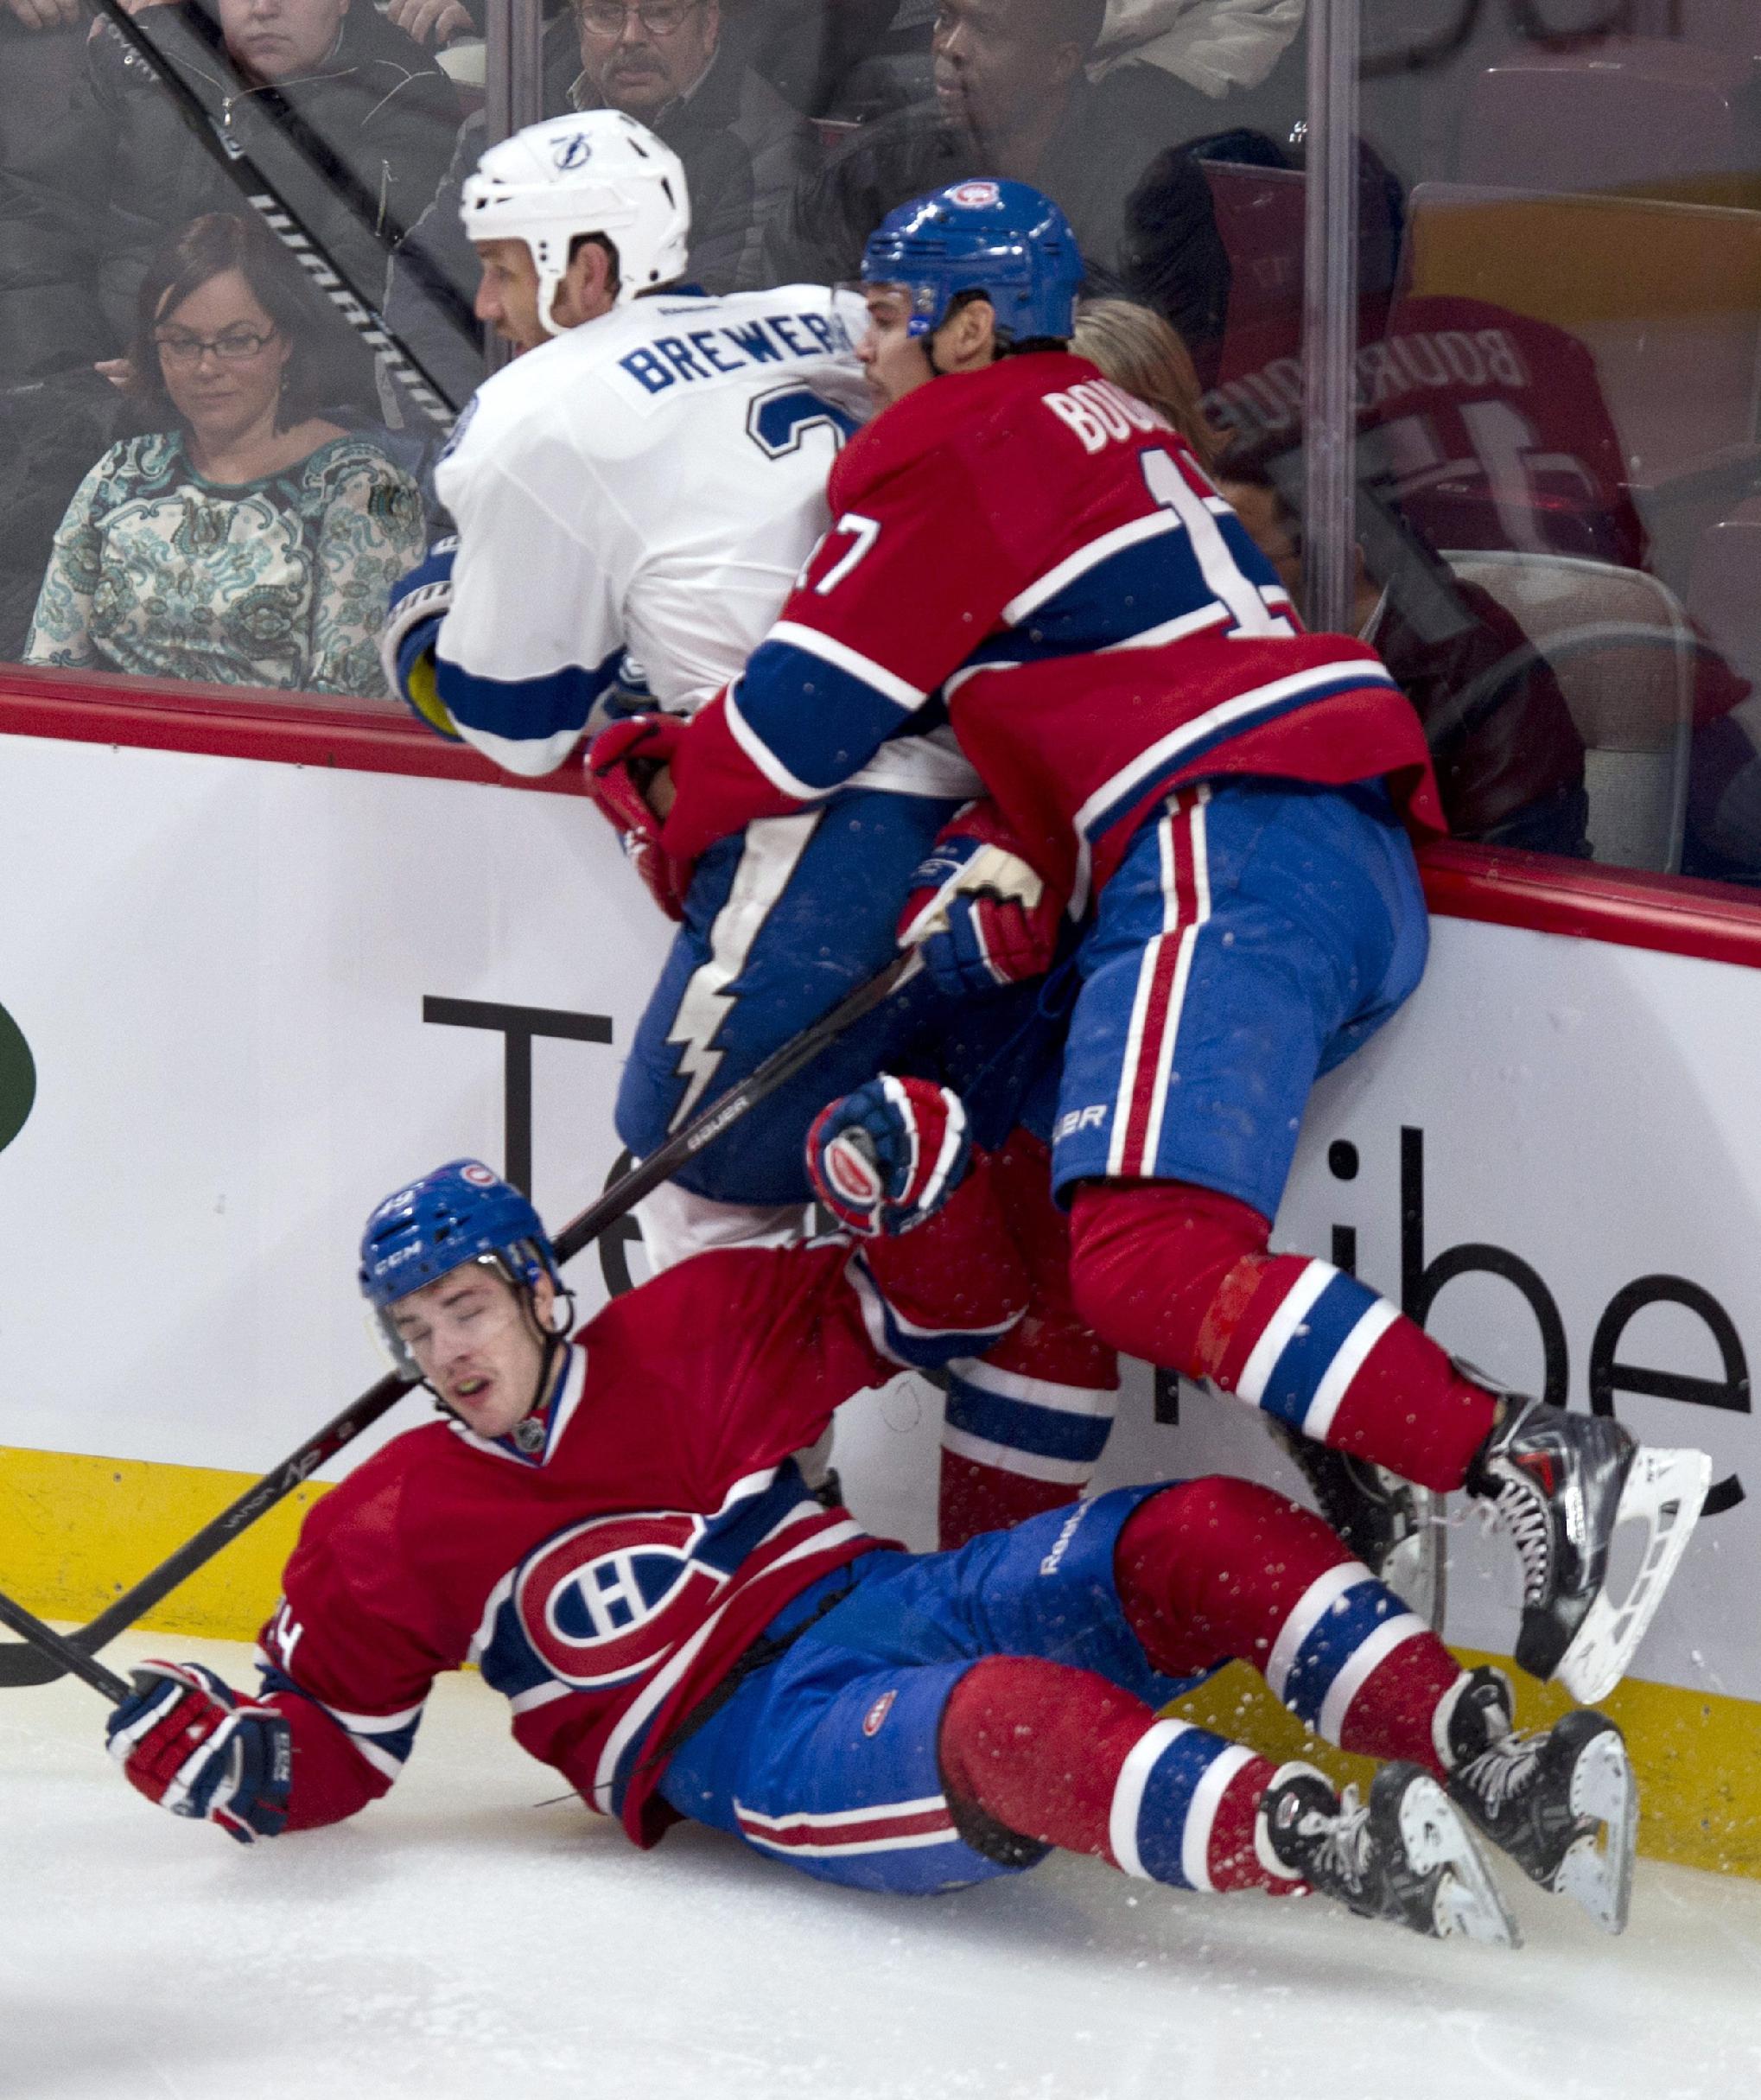 Lightning slip past Canadiens 2-1 in shootout